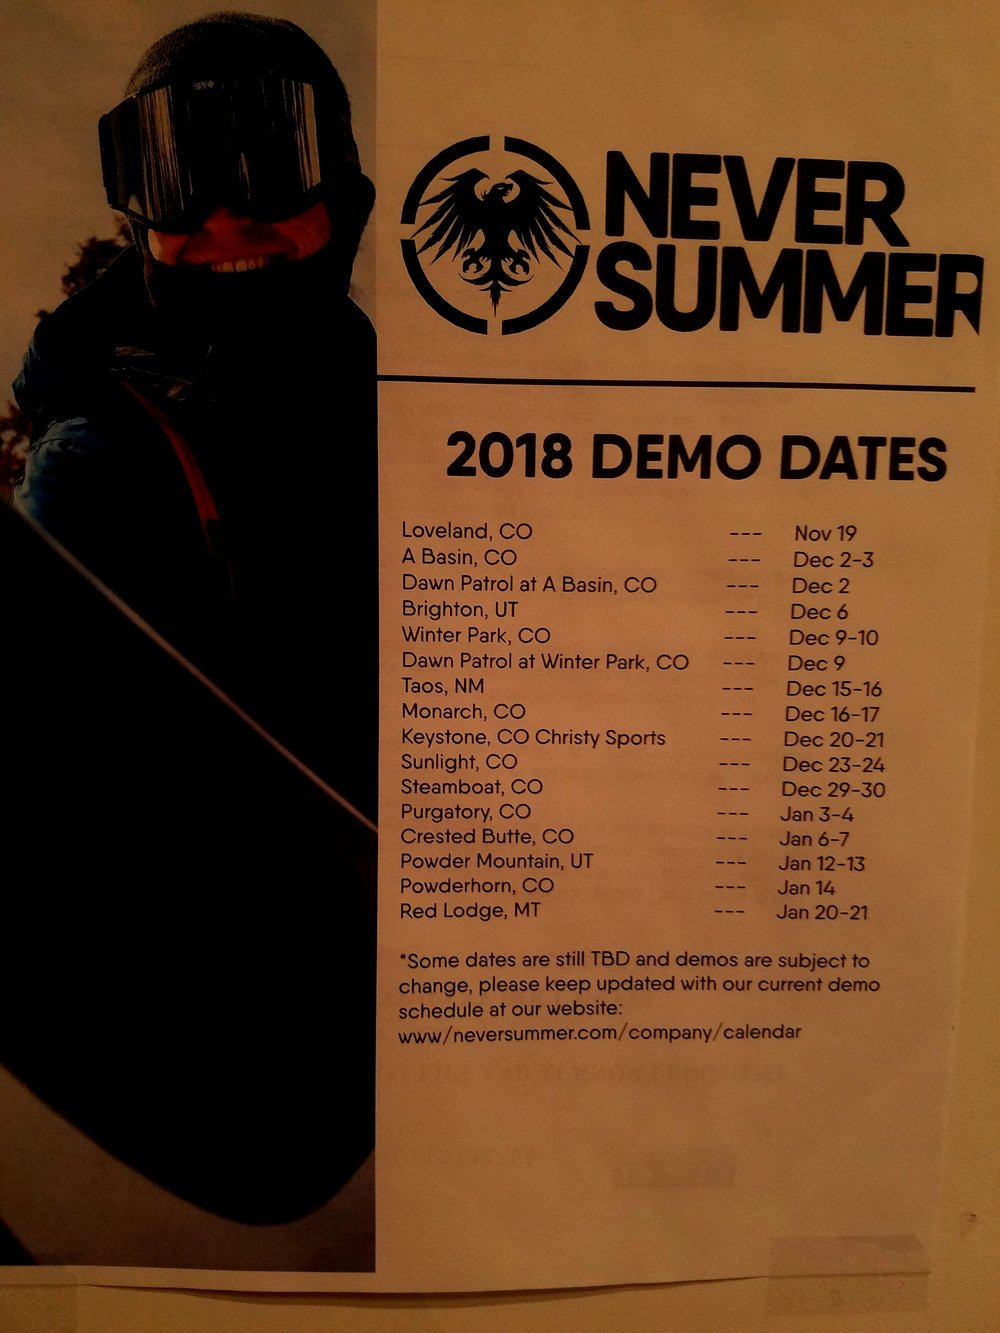 Never Summer Demo Days Blog Photo.jpg